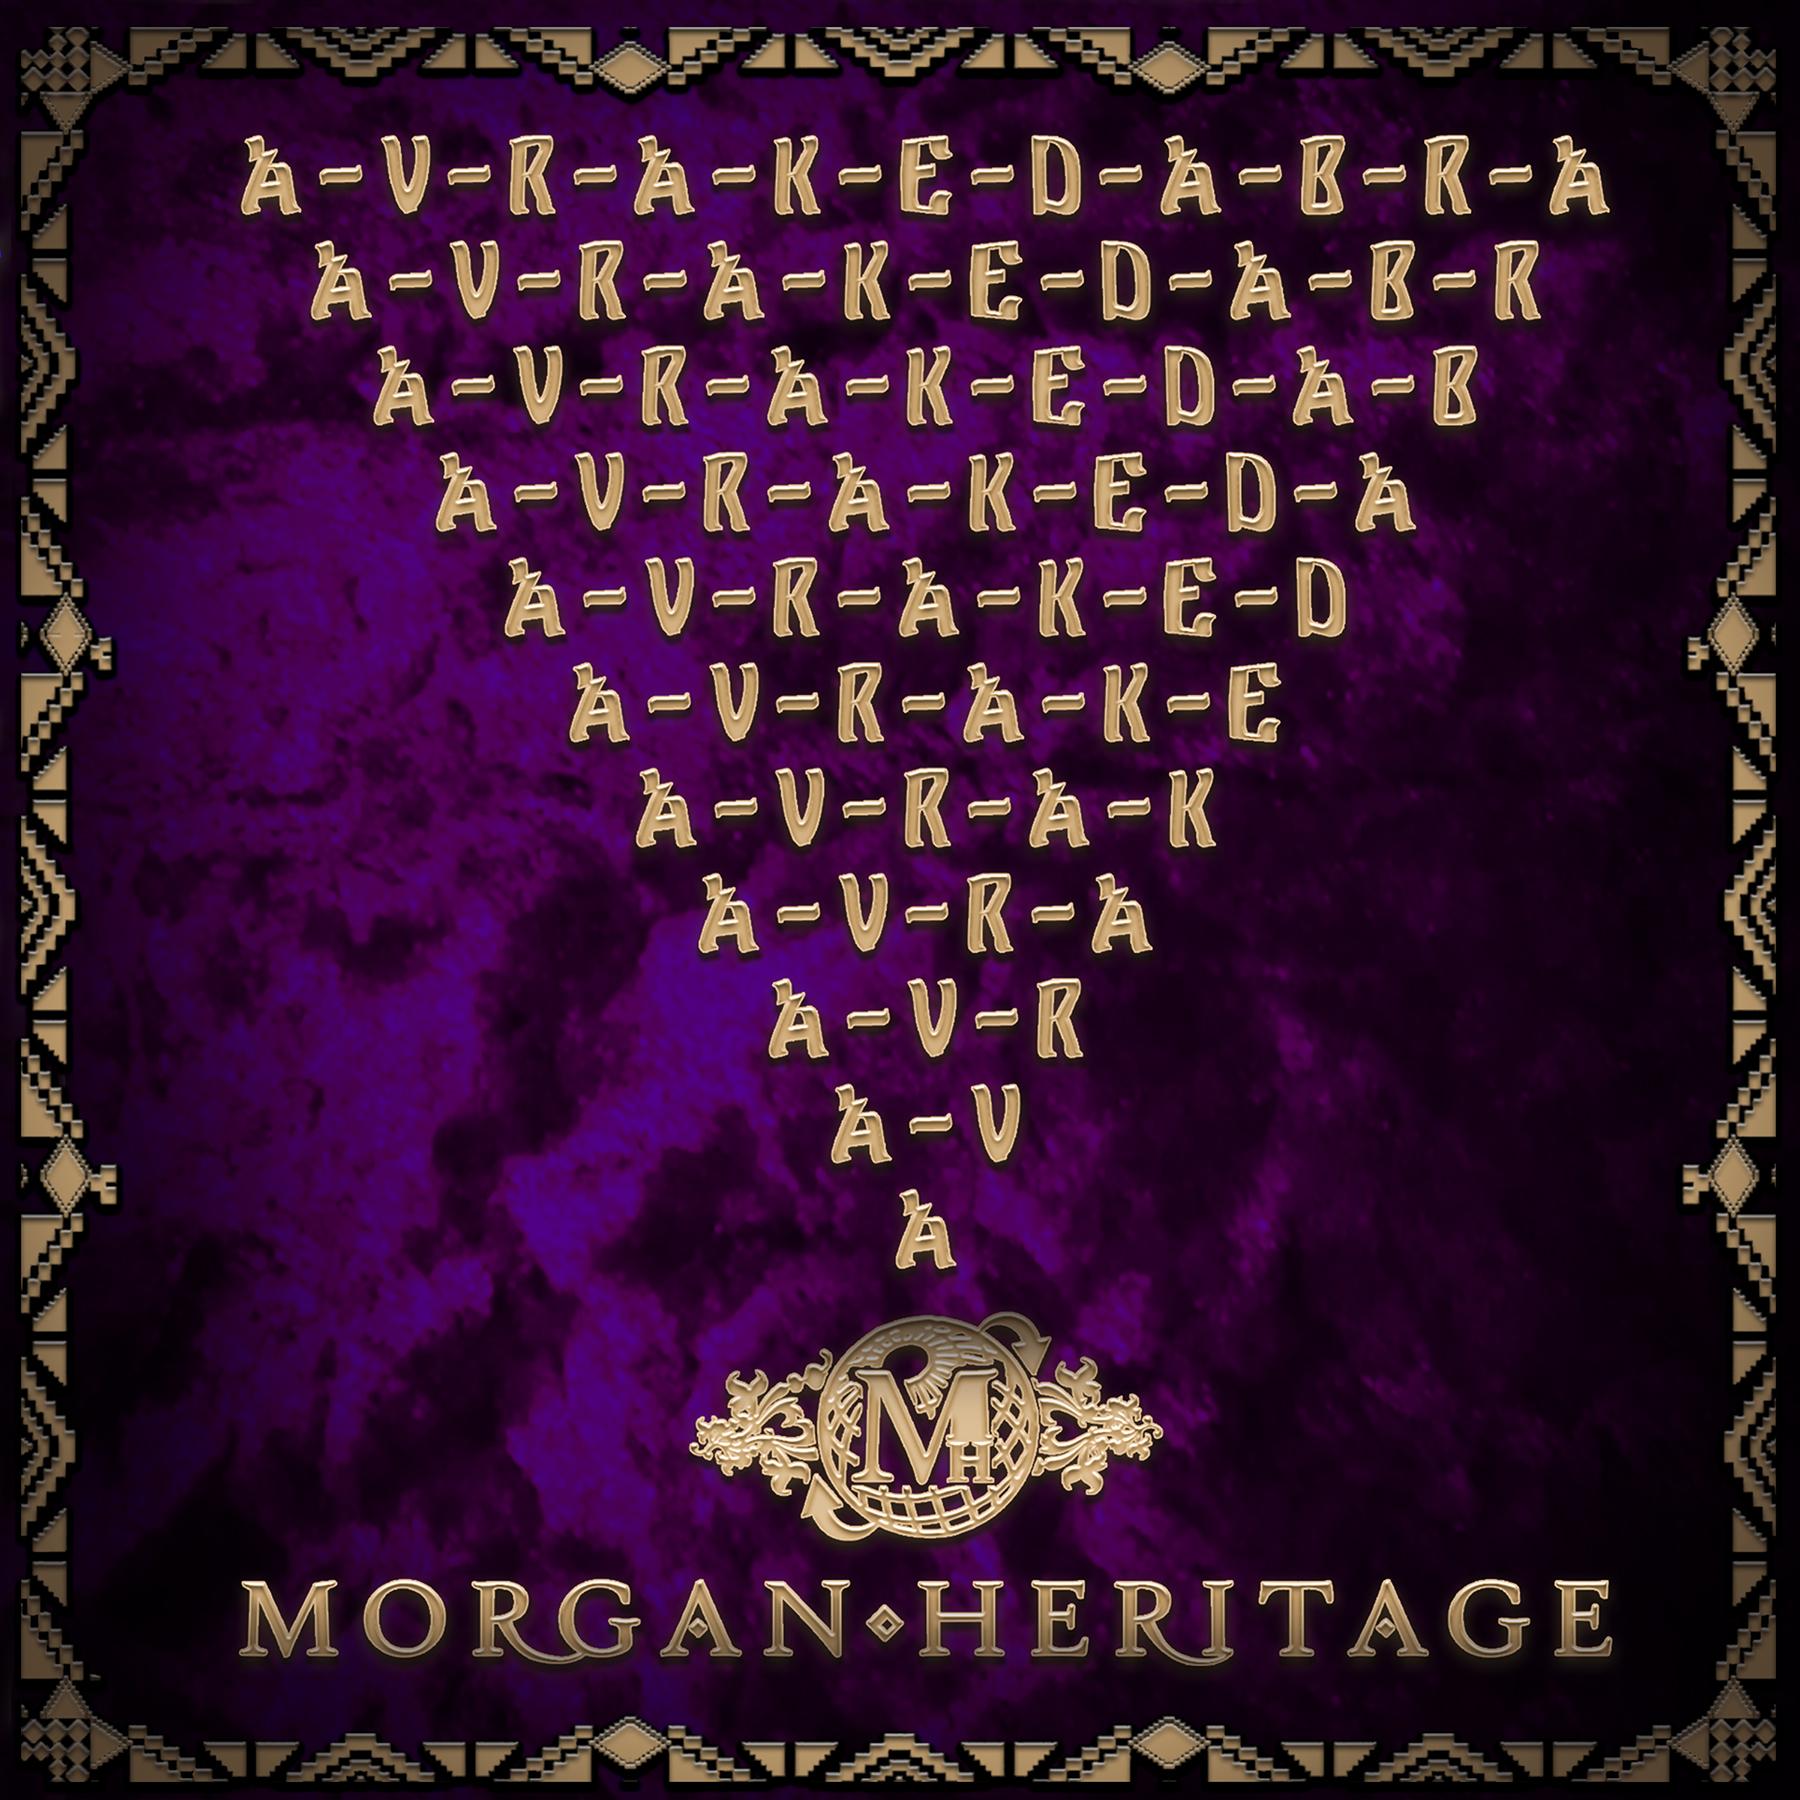 Morgan Heritage - Avrakedabra Album Cover.jpg